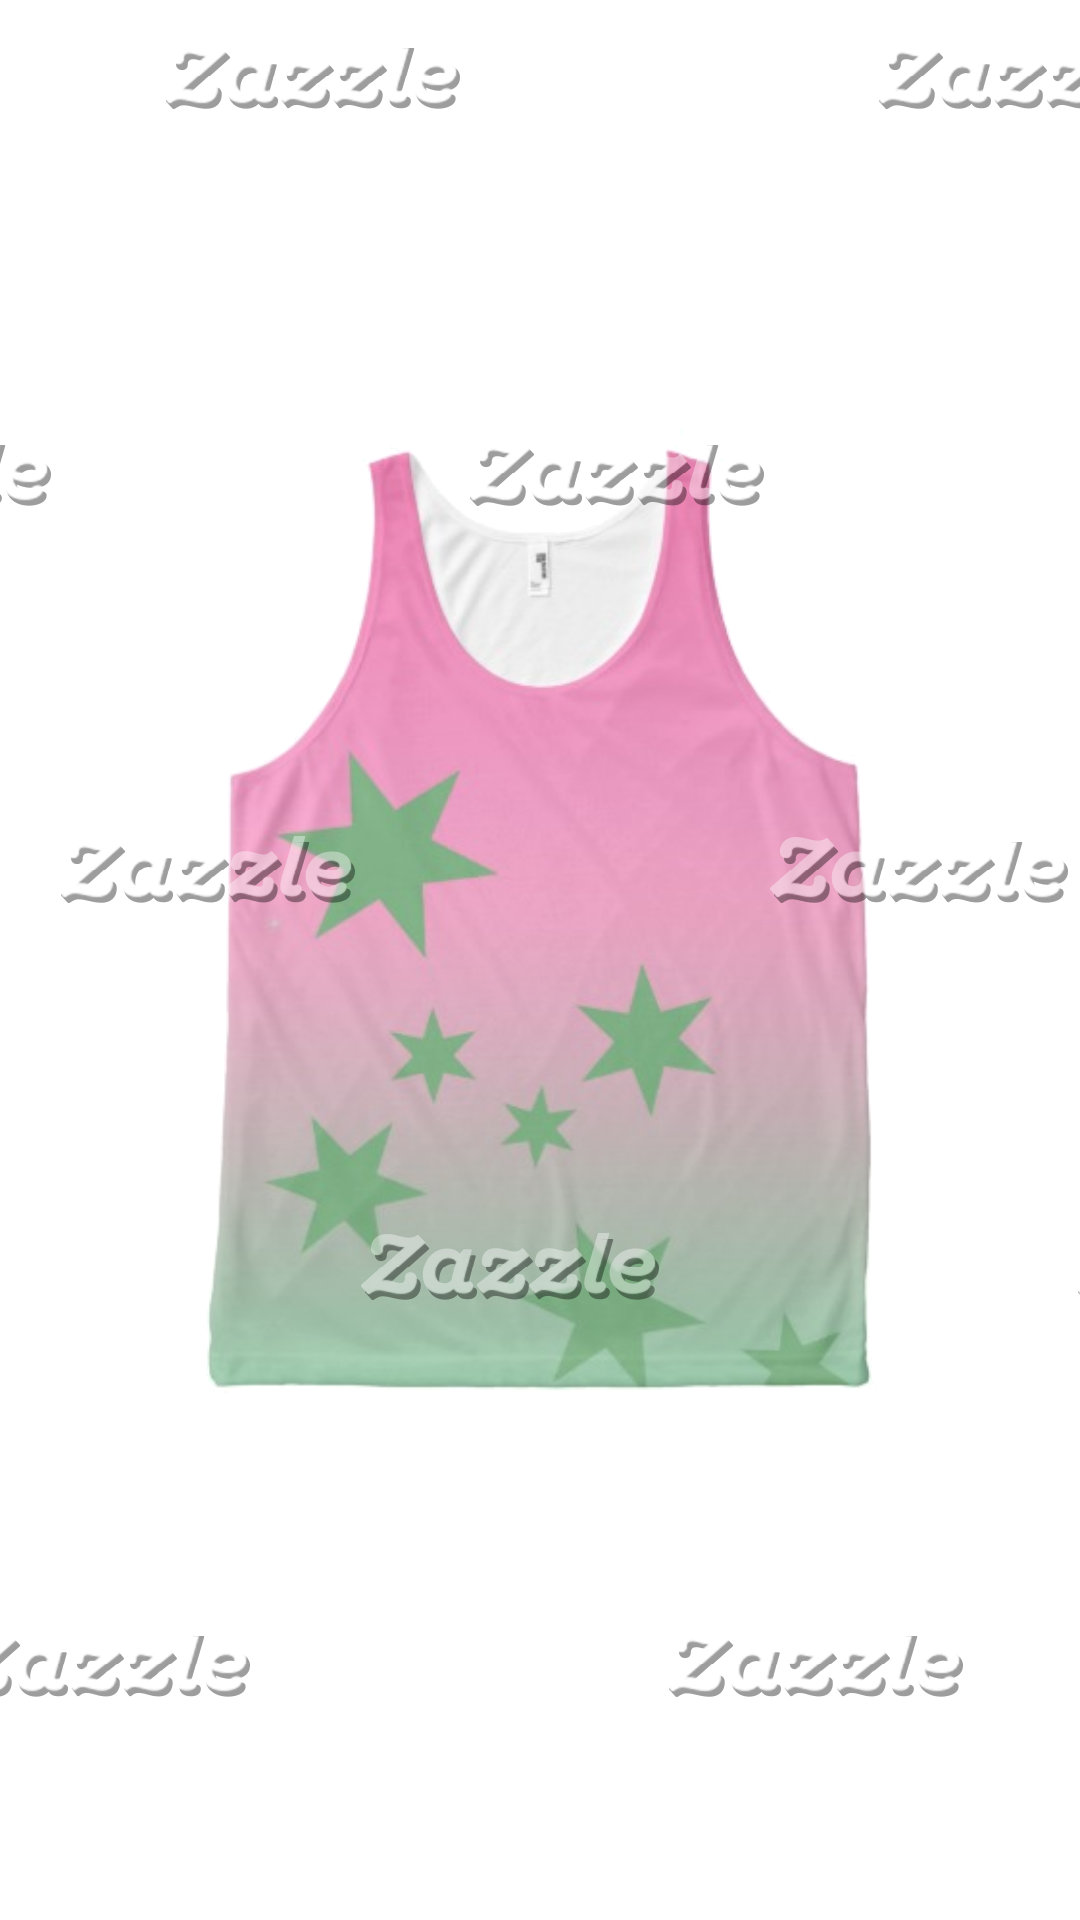 Ladies Clothing & Apparel